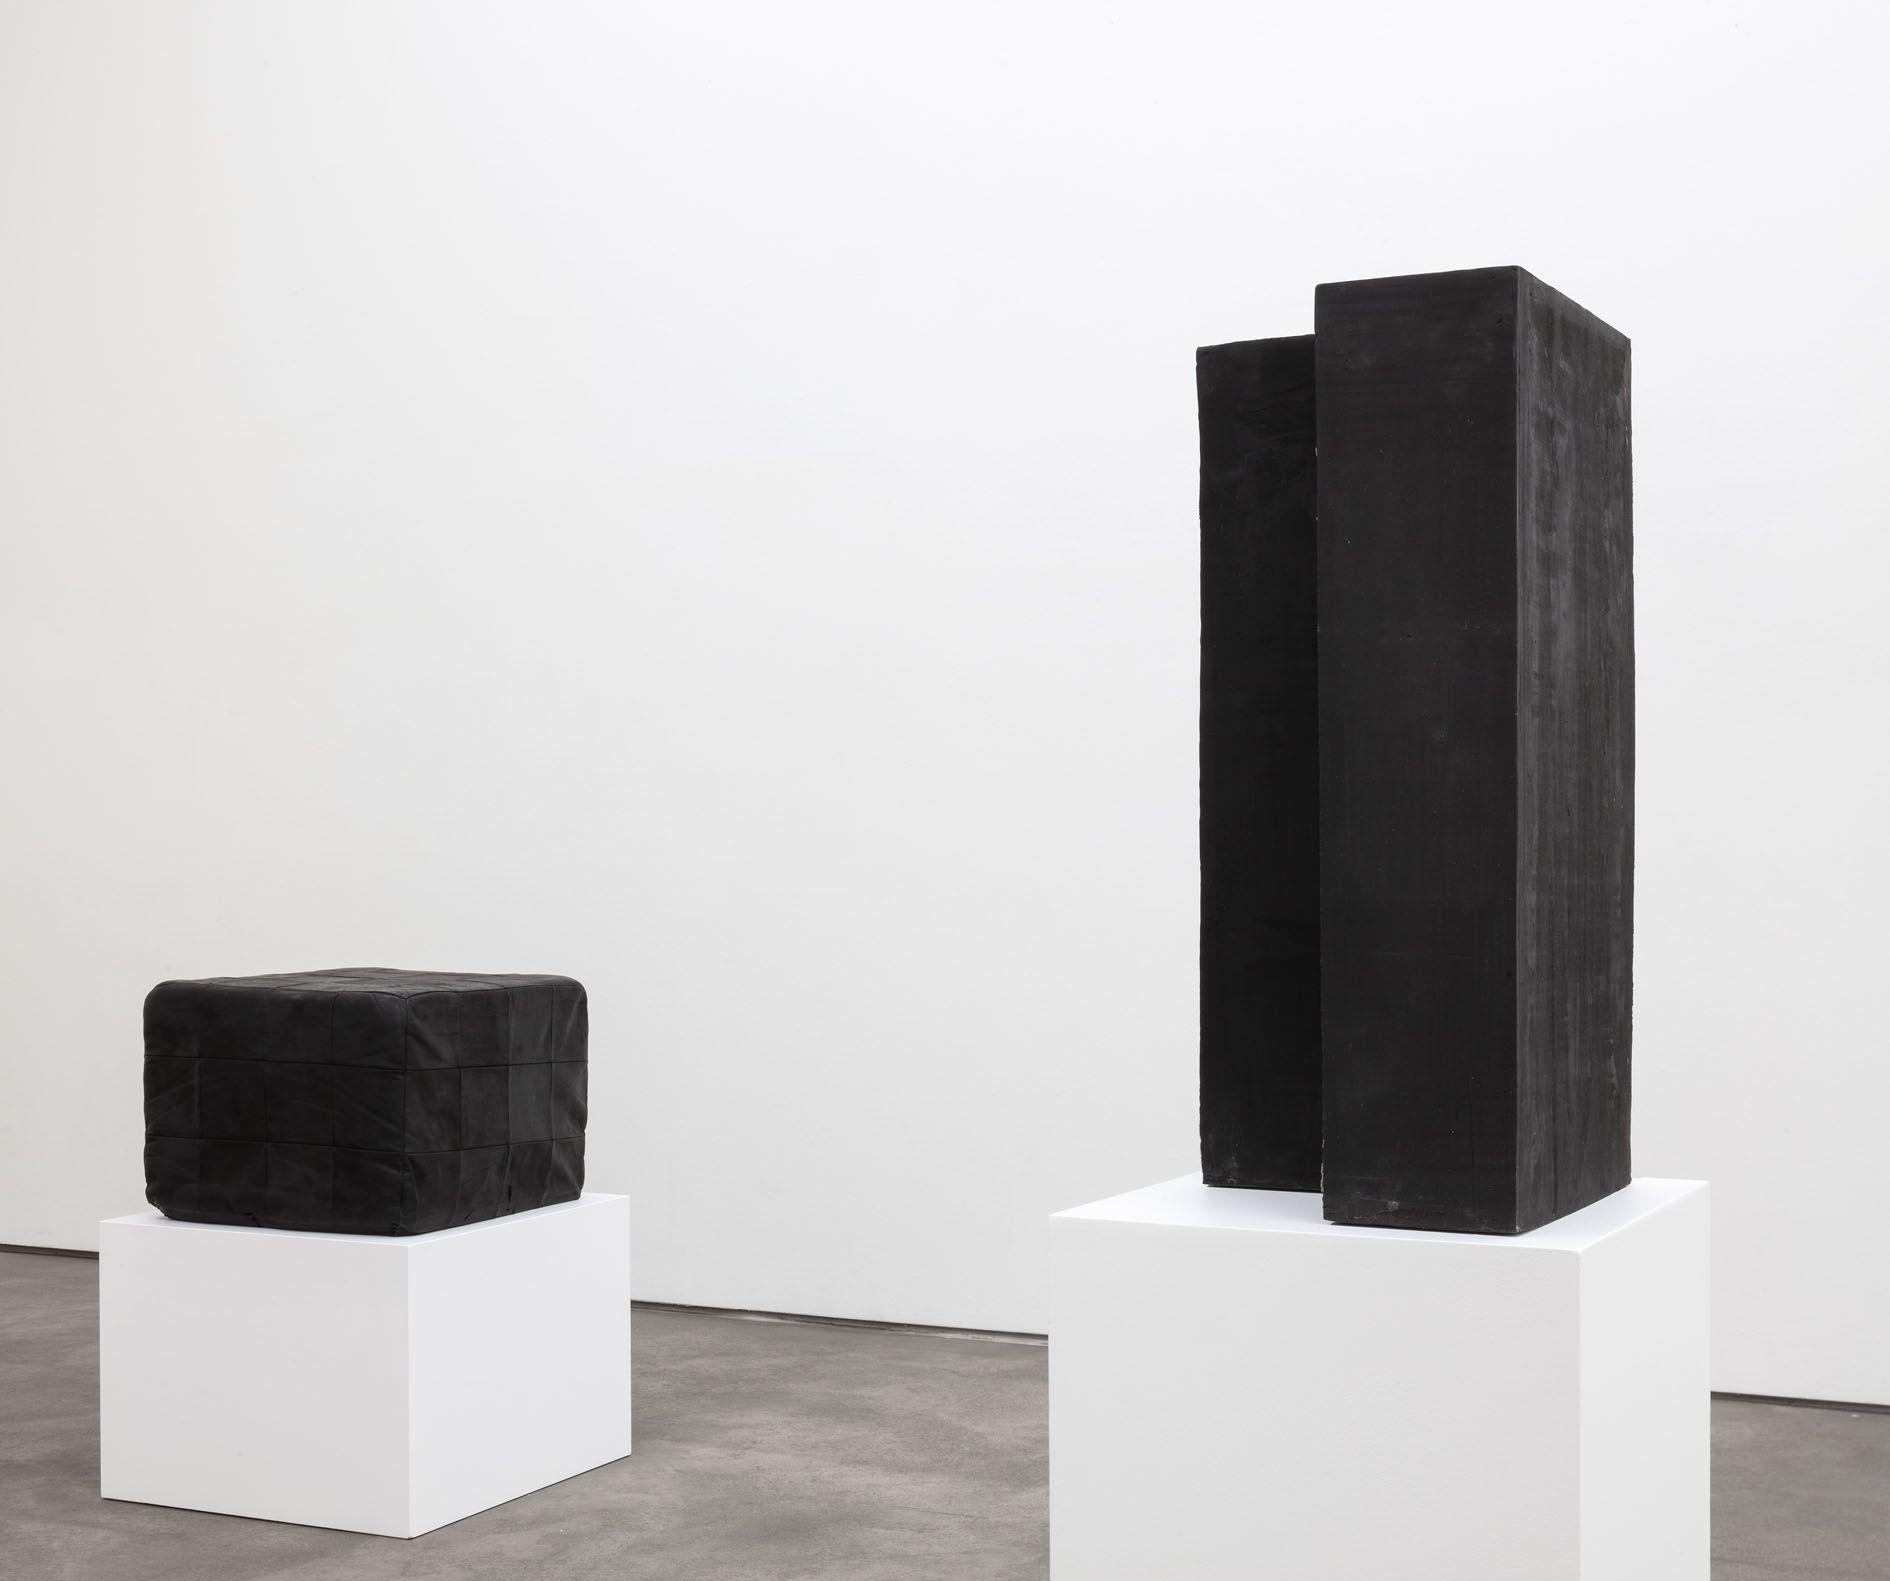 Peter FischliDavid Weiss – HAUS – Berlin